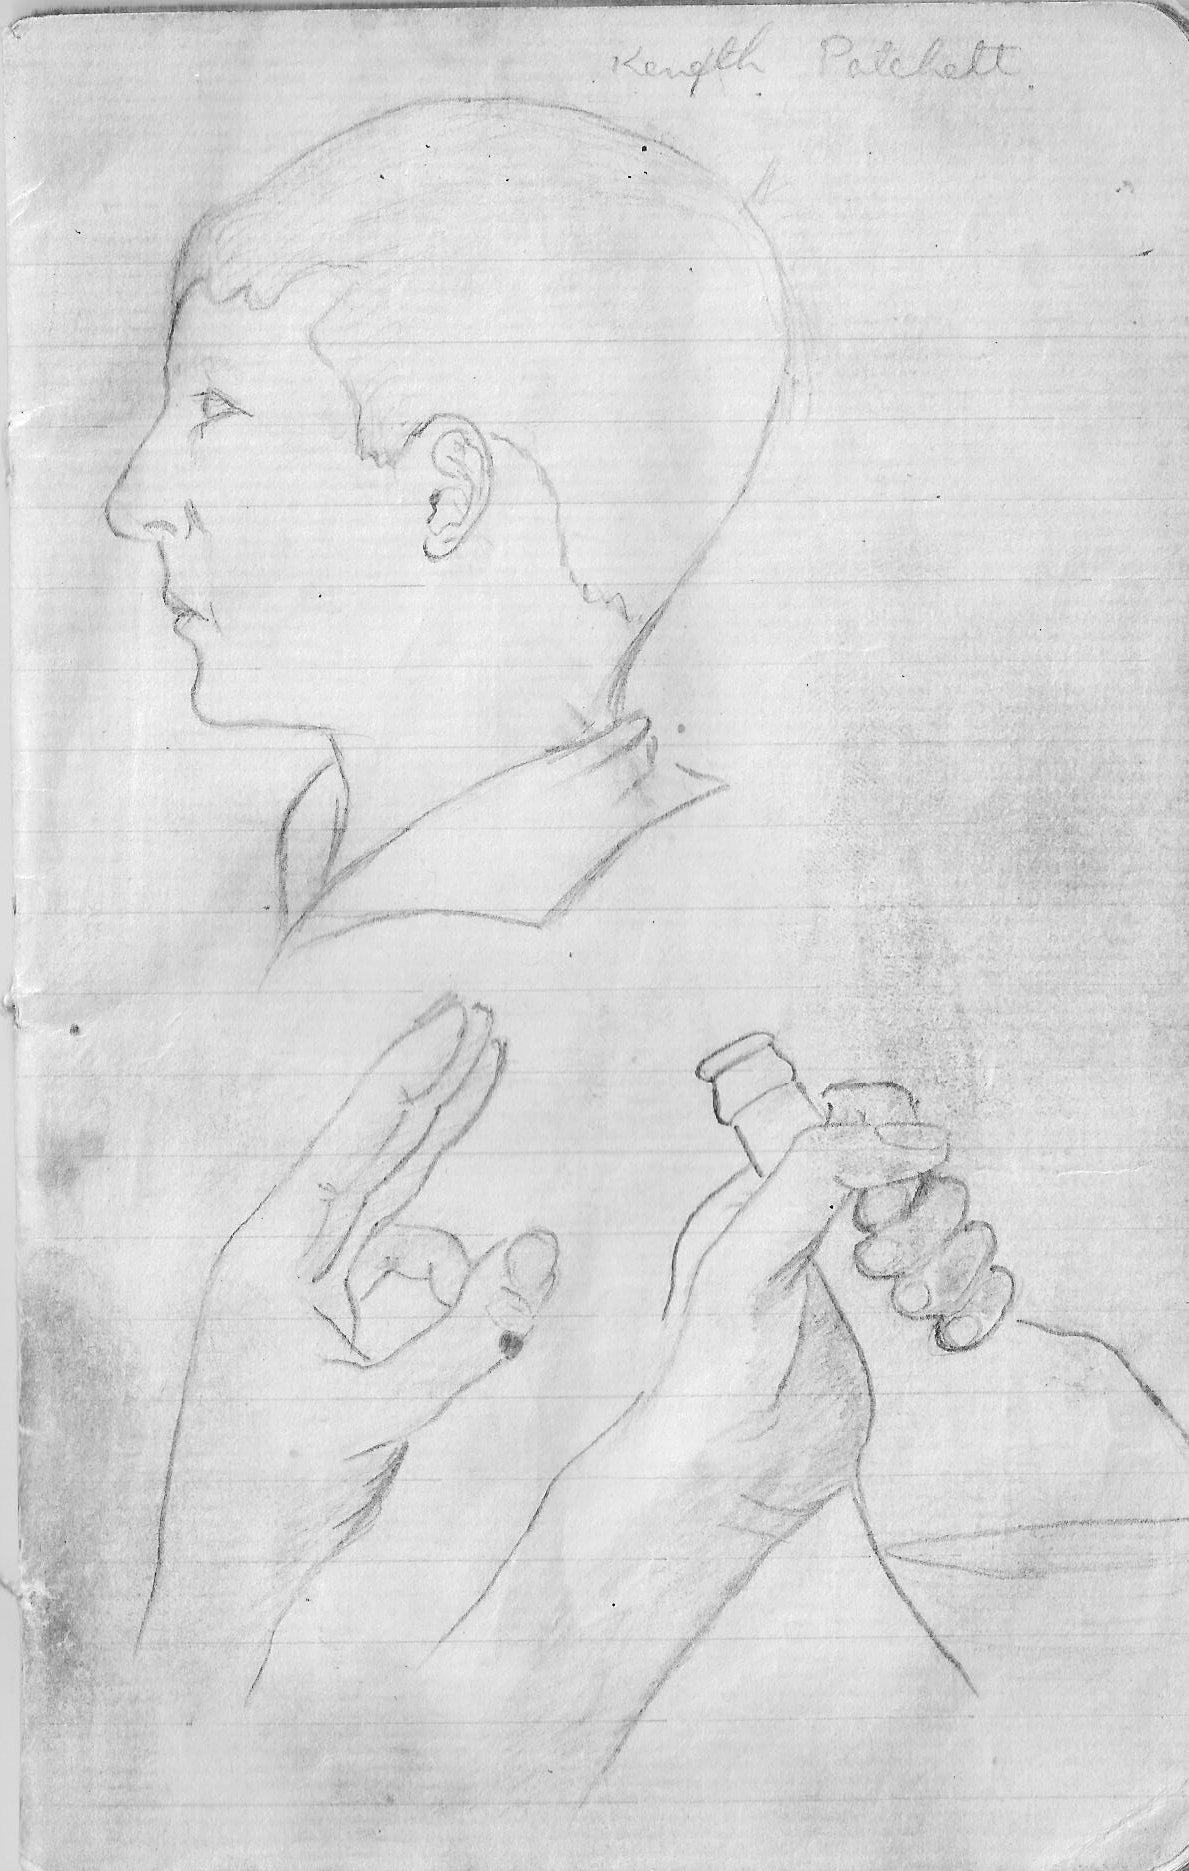 Sketches in Wehsien Camp